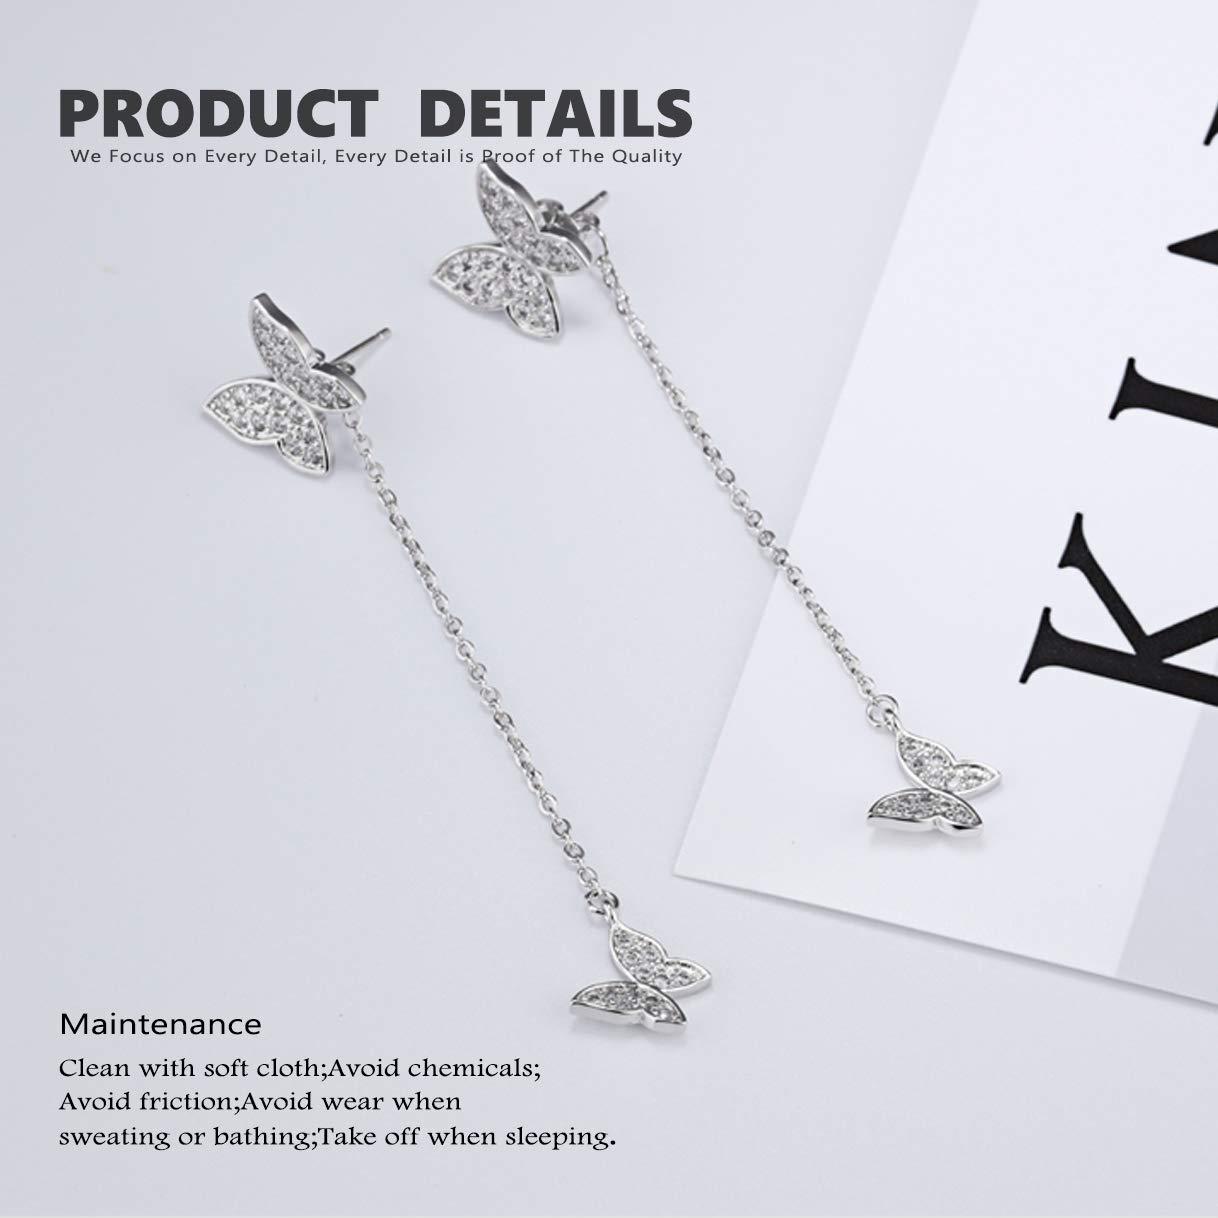 CHARMFAME White Gold Plated Copper Butterfly Drop Earrings CZ Inlaid Long Chain Tassel Dangle Earrings for Women /& Girls